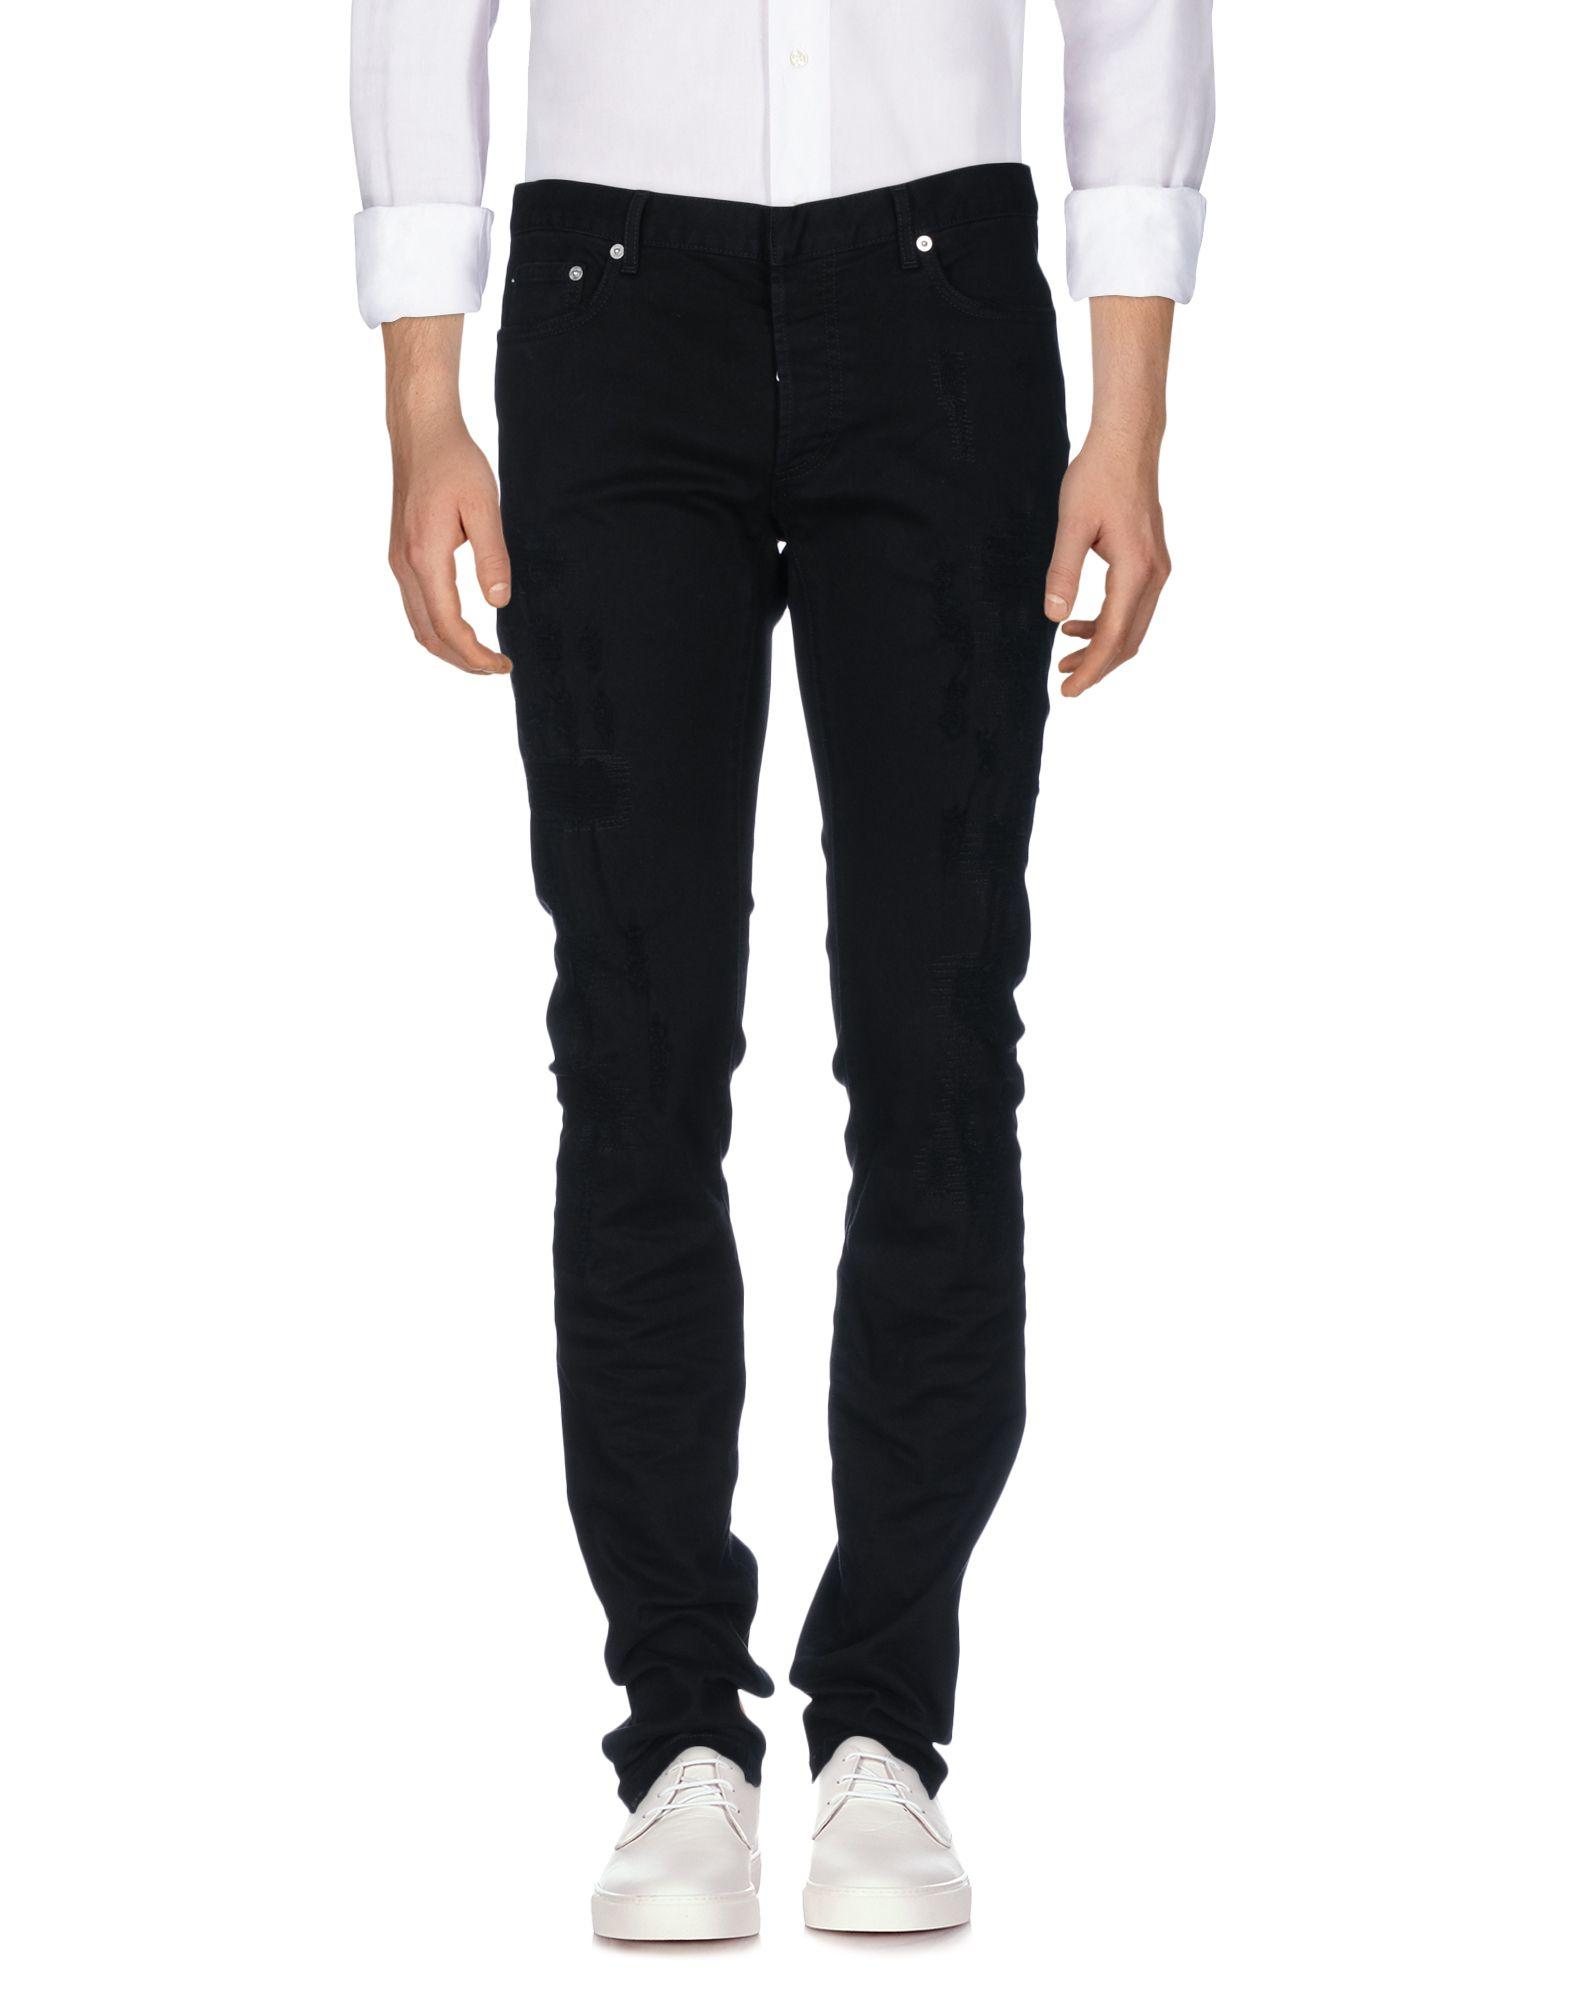 Pantaloni Jeans Dior Homme - Uomo - Homme 42623951JG 704fab